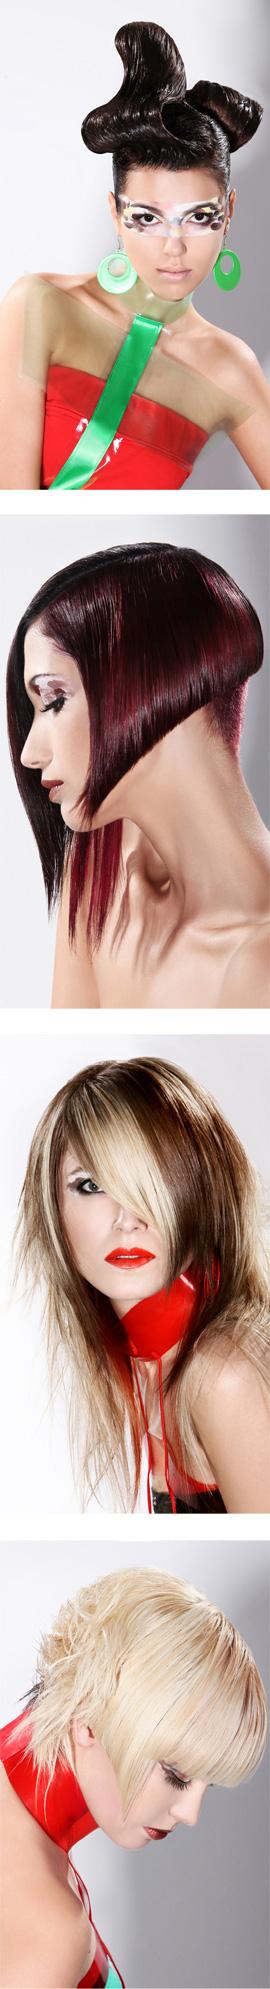 ORENORKOBI - קולקציית עיצוב שיער 3D